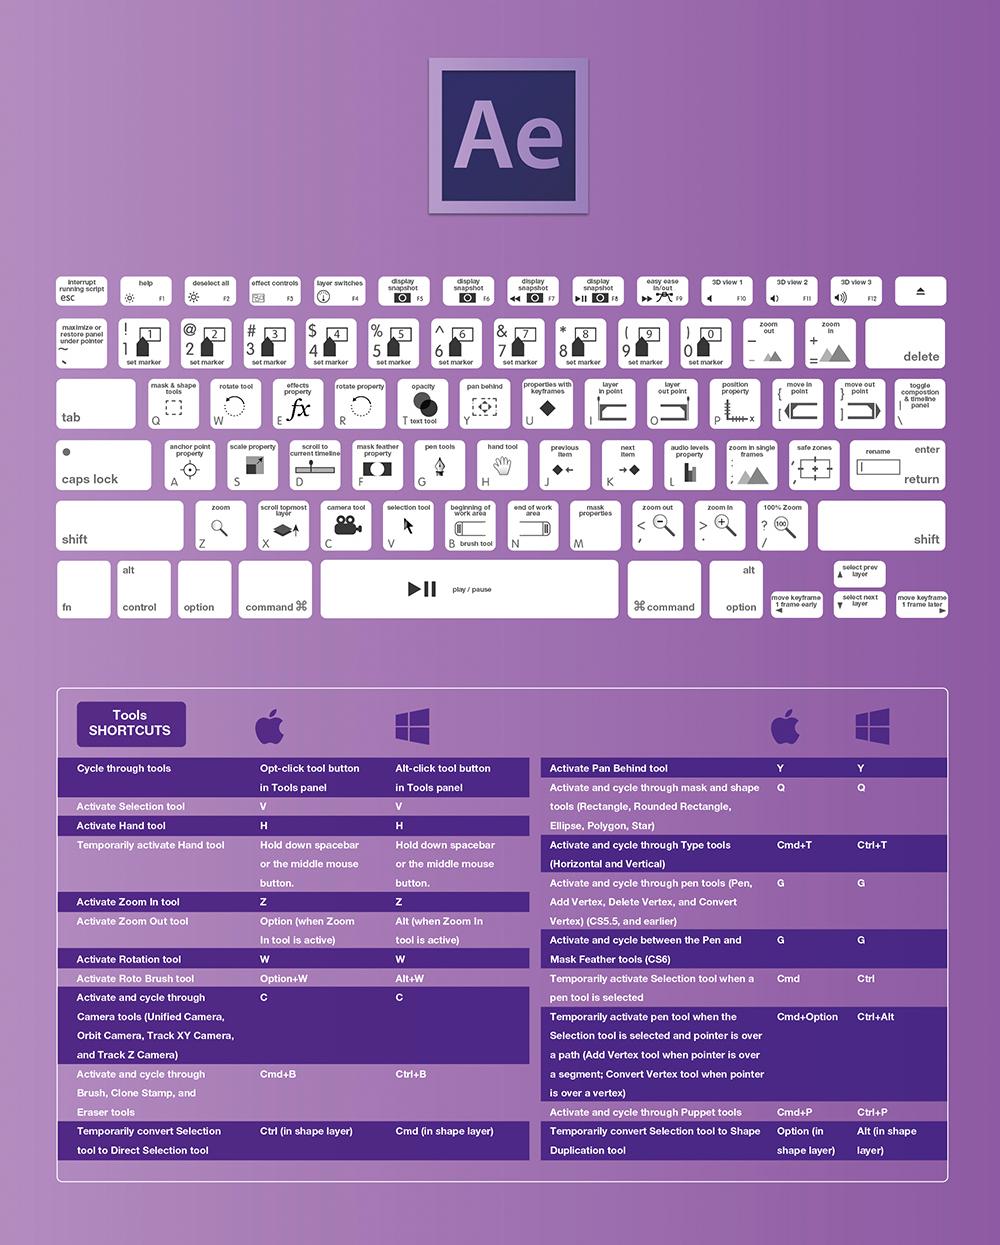 medium resolution of after effects cc shortcuts keyboard shortcuts adobe diagram artwork